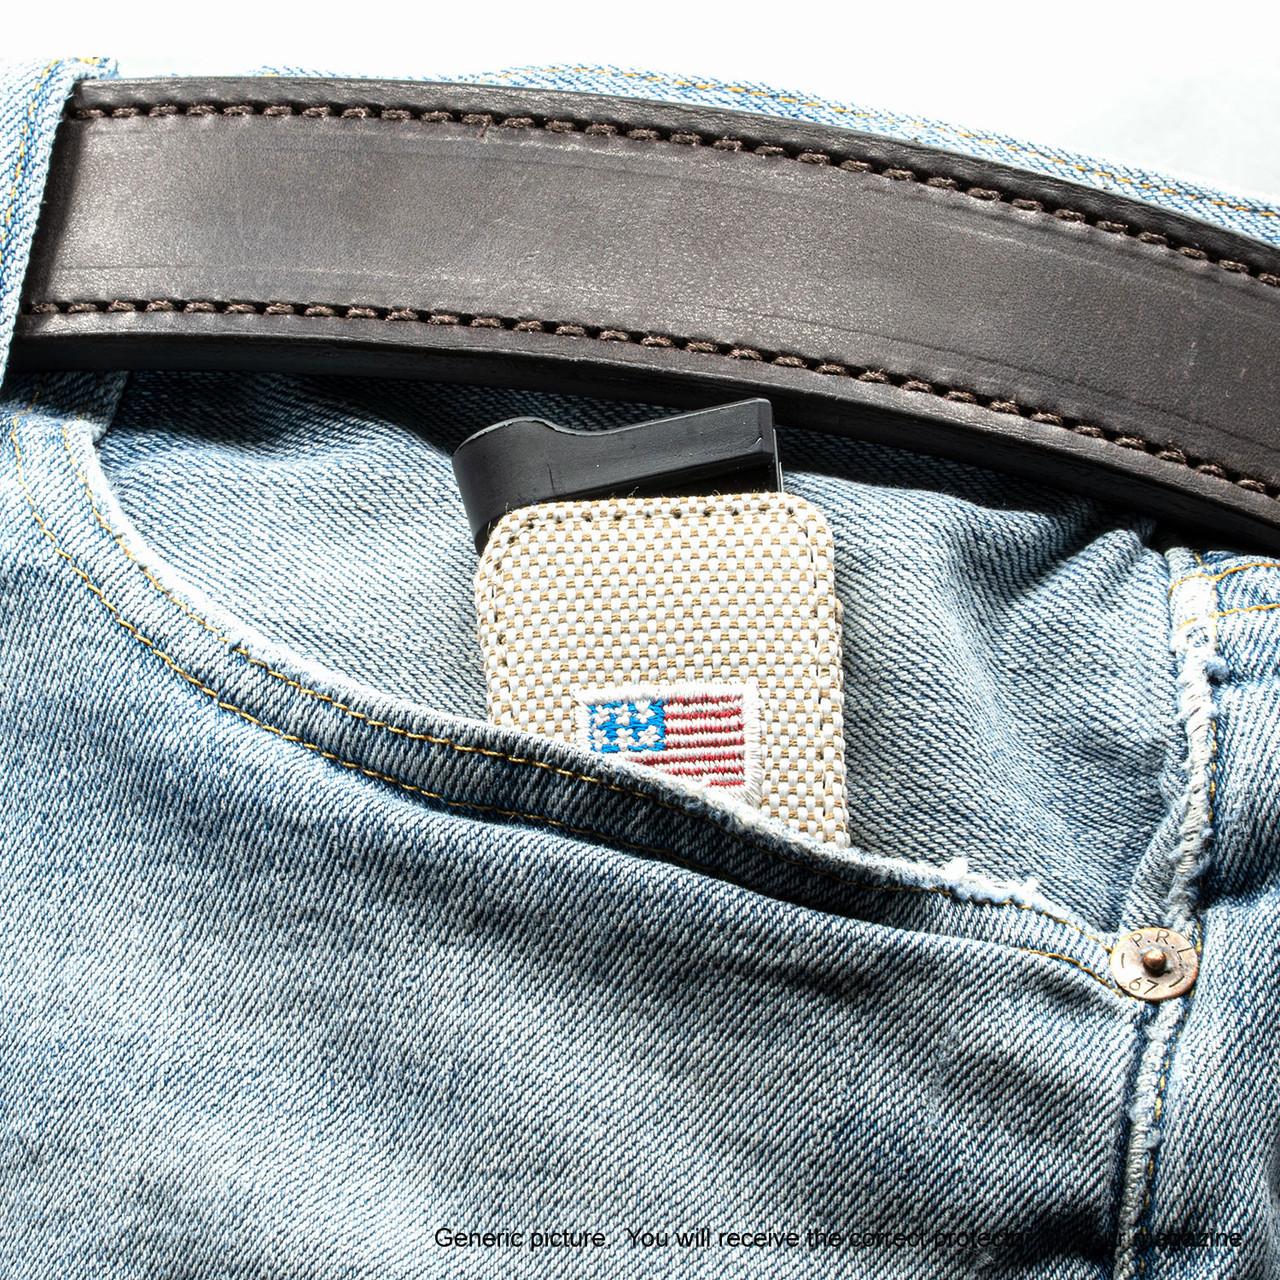 M&P Shield .40 Tan Canvas Flag Magazine Pocket Protector